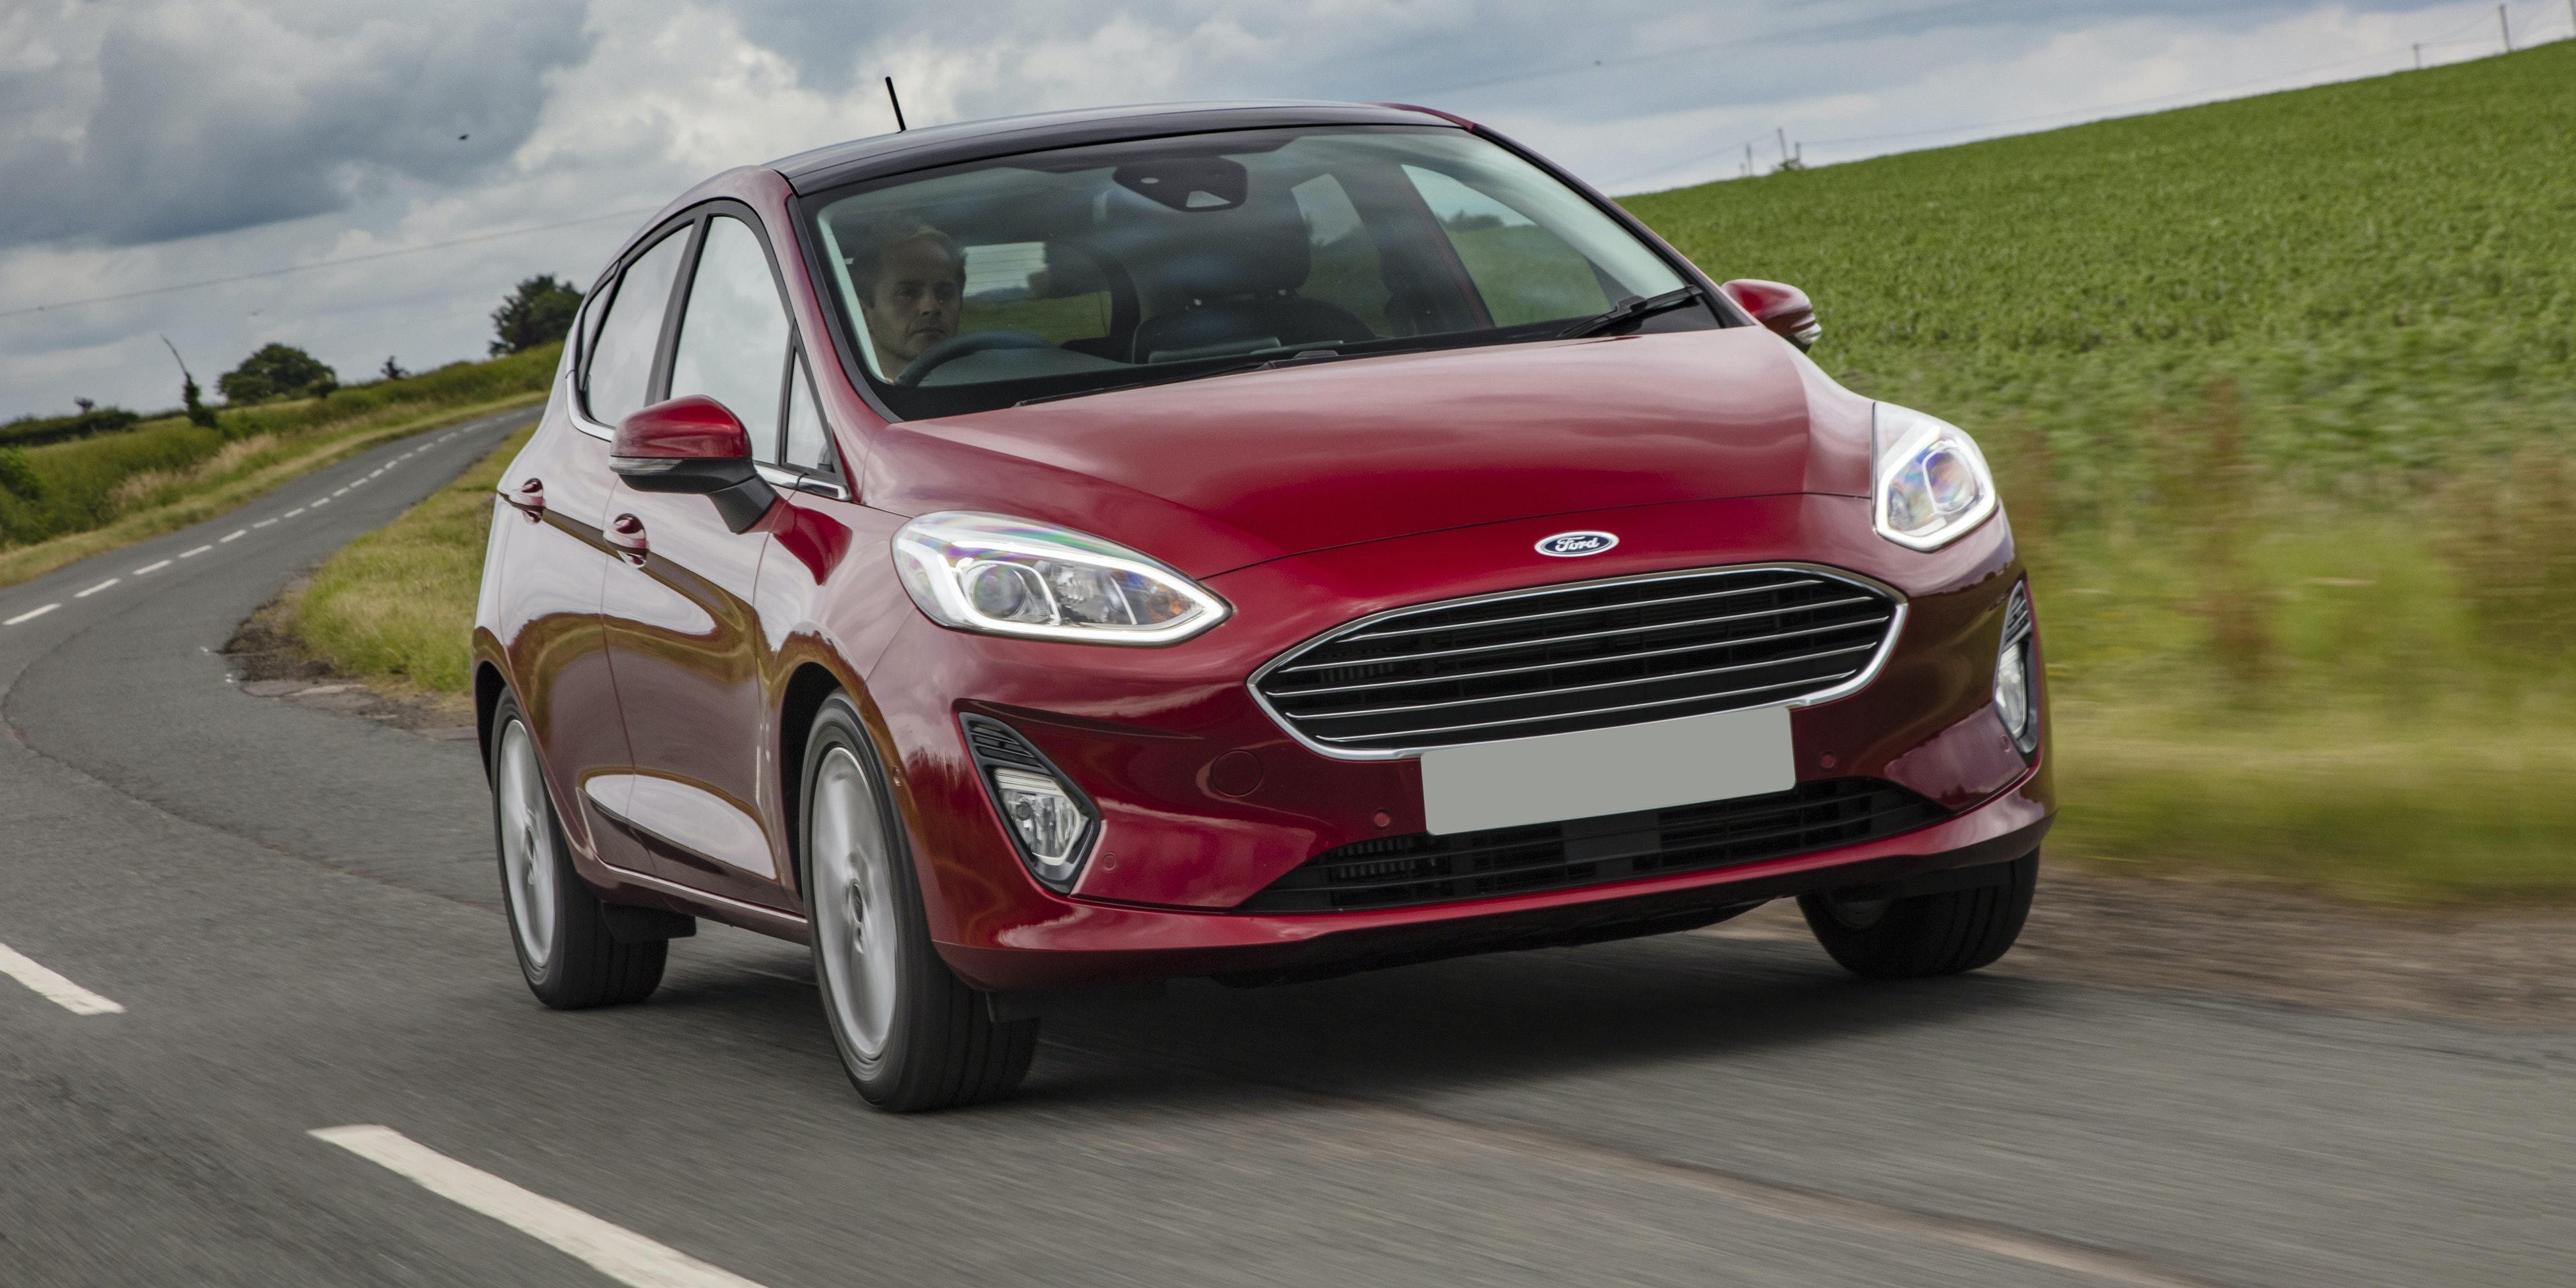 AVG. SAVING £1679. 8.3. Ford & Ford Small cars u2013 reviews | carwow markmcfarlin.com